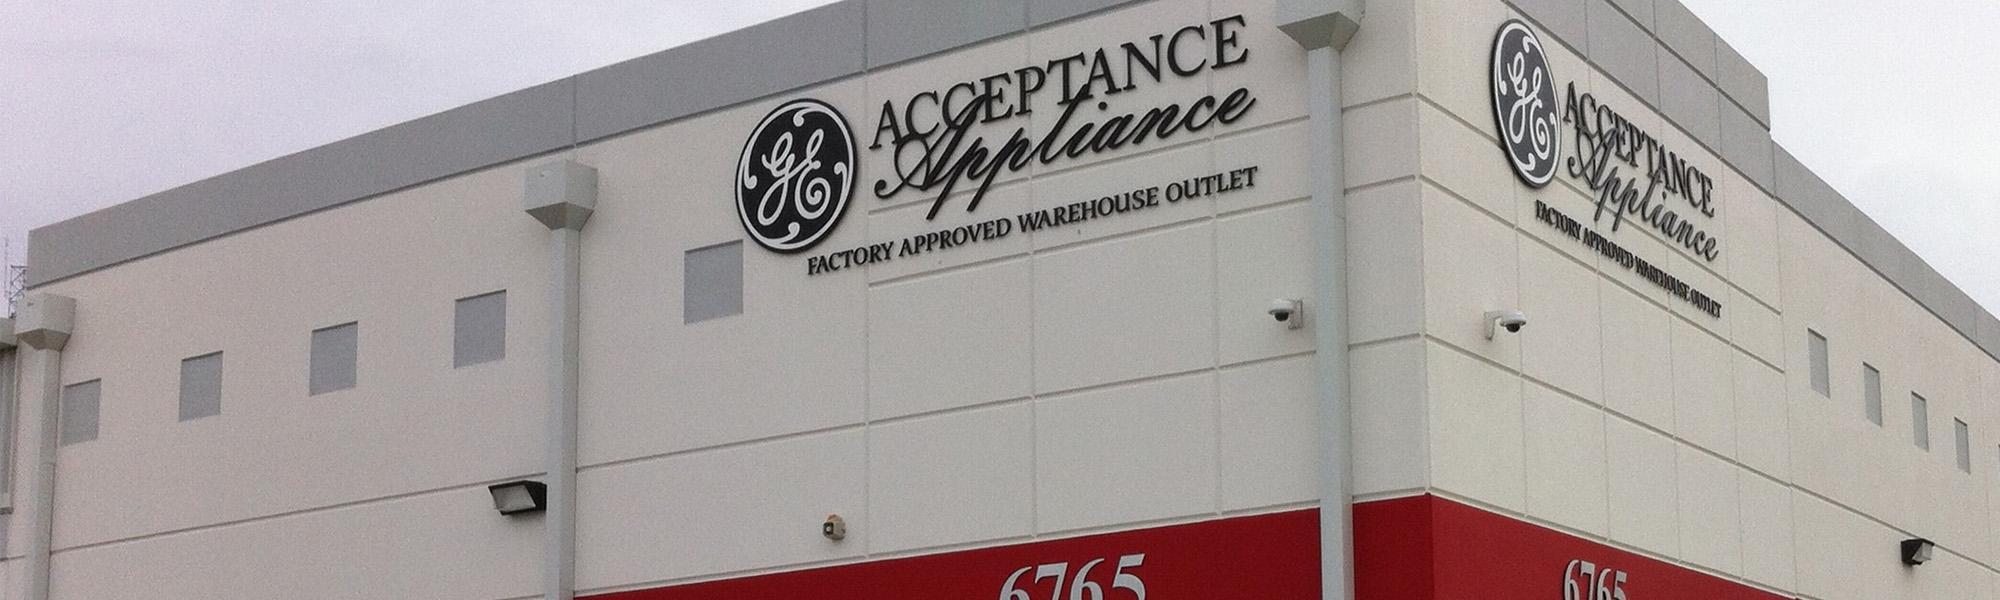 Acceptance Appliance Centers